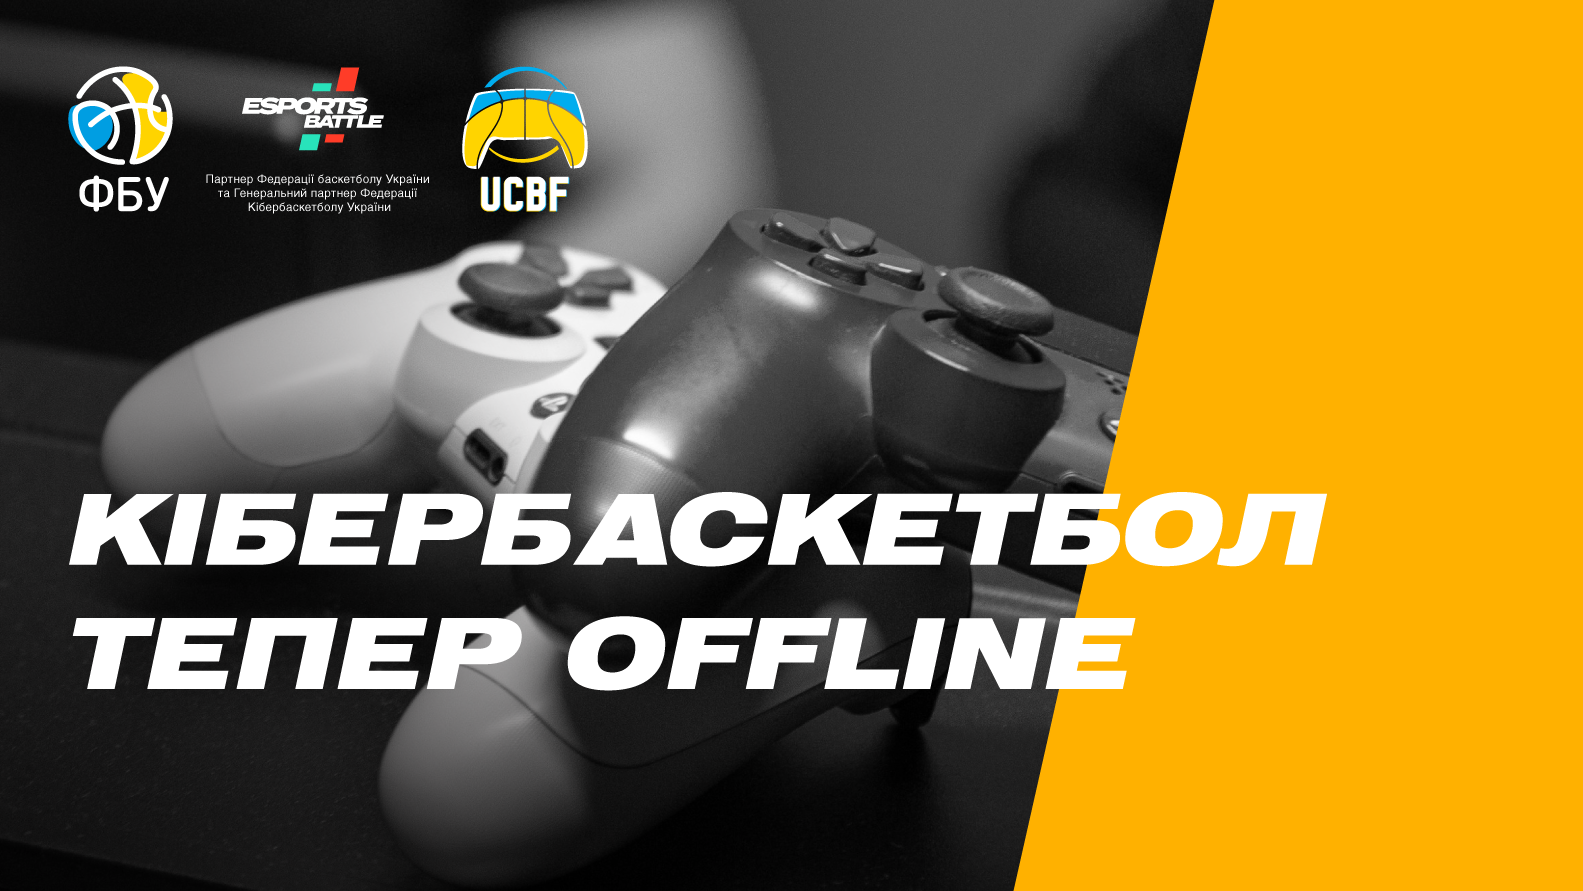 Заняття з кібербаскетболу тепер OFFLINE: уроки ESportsBattle Academy в Cyberring Club